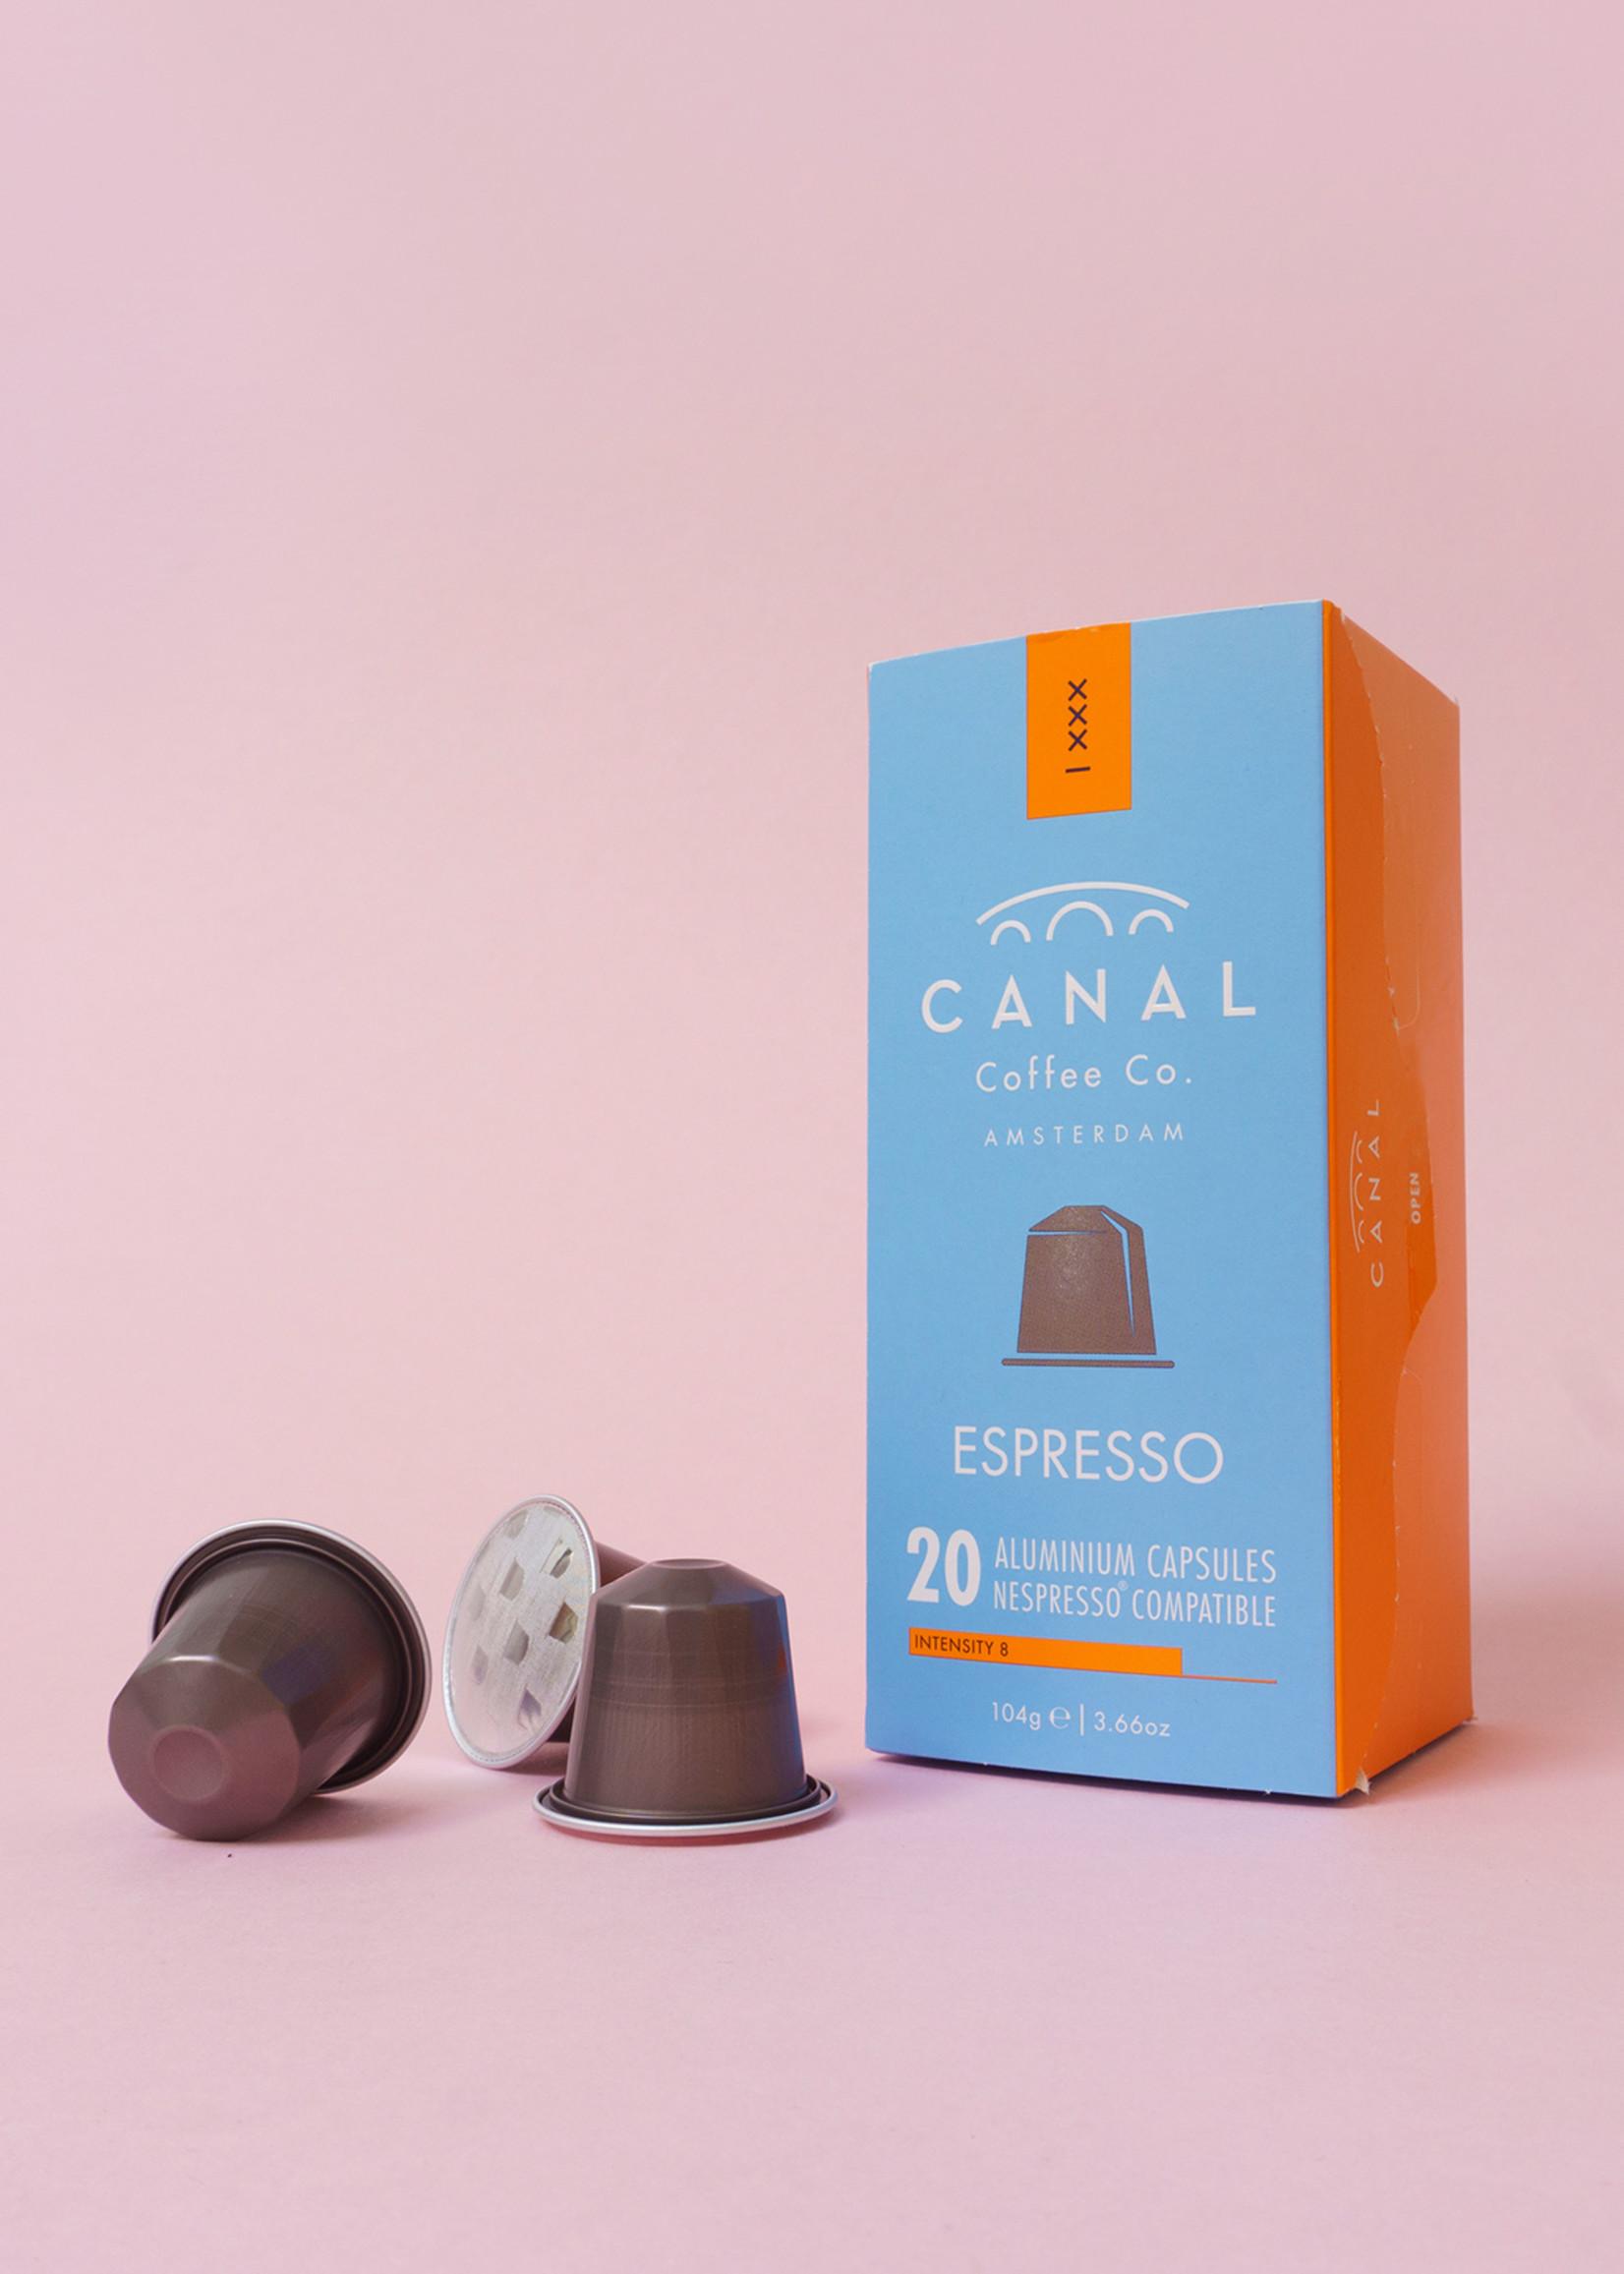 Canal Coffee & Co Biologisch en fairtrade Canal Espresso capsules